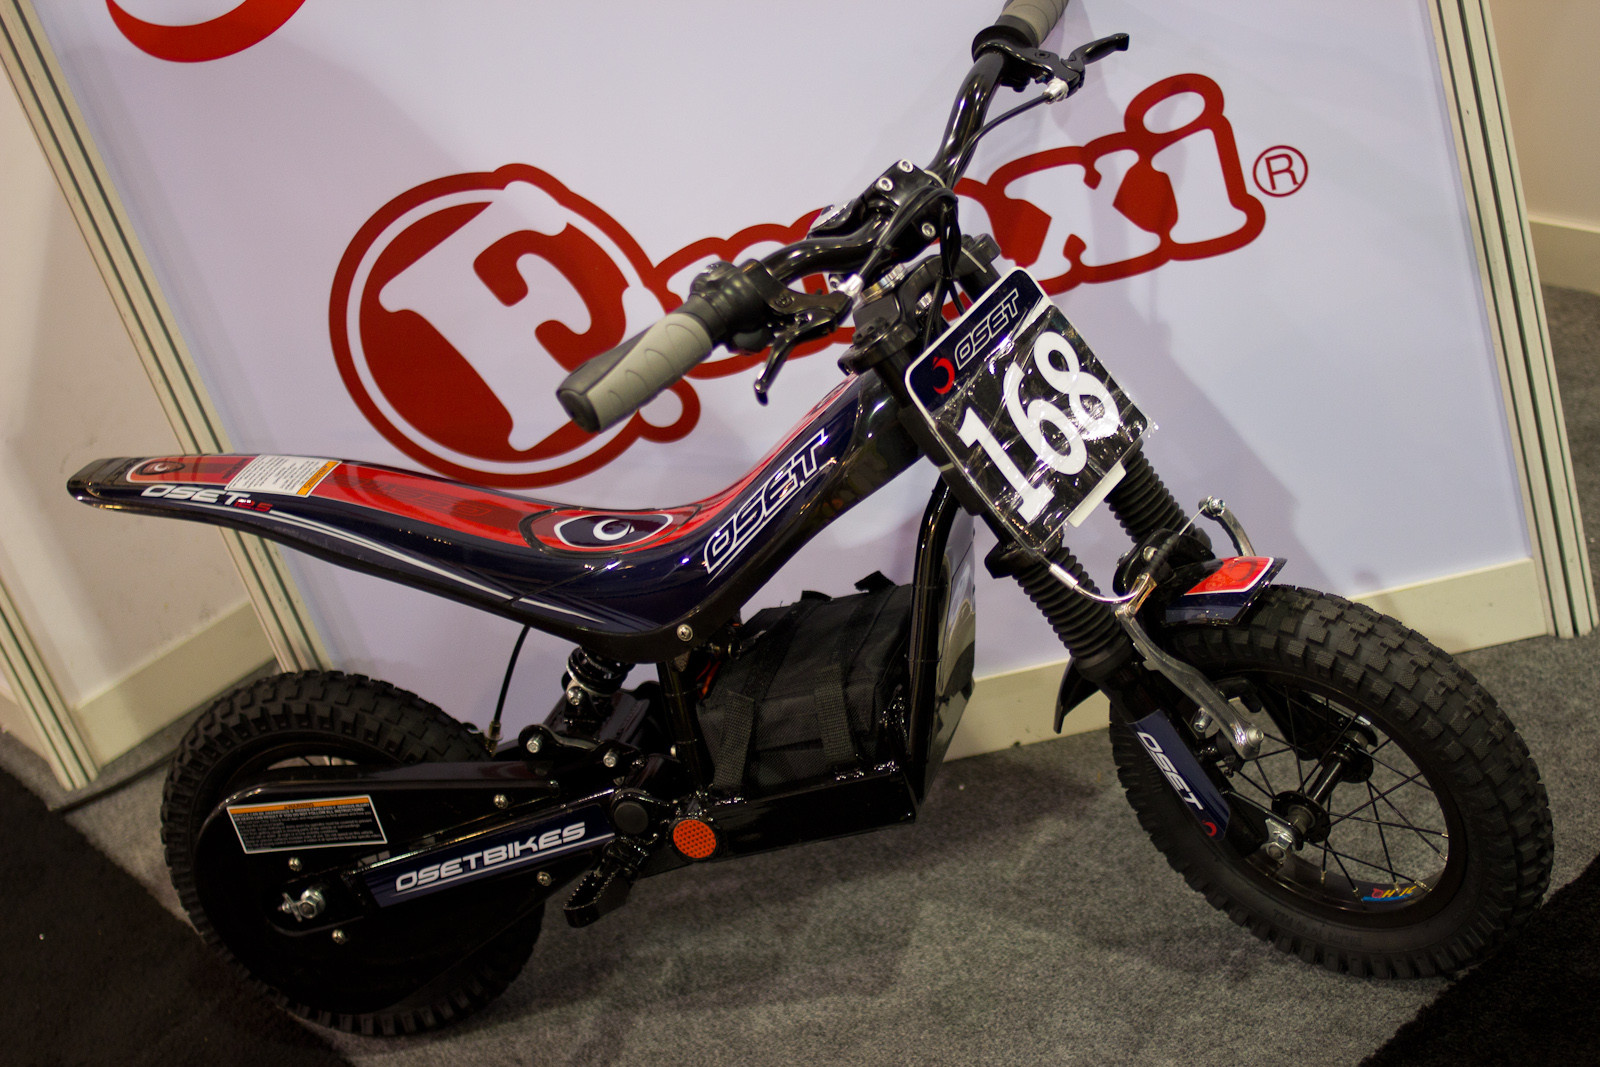 Mini Trials Moto Bike - Random, Wacky, and Weird from Interbike 2012  - Mountain Biking Pictures - Vital MTB